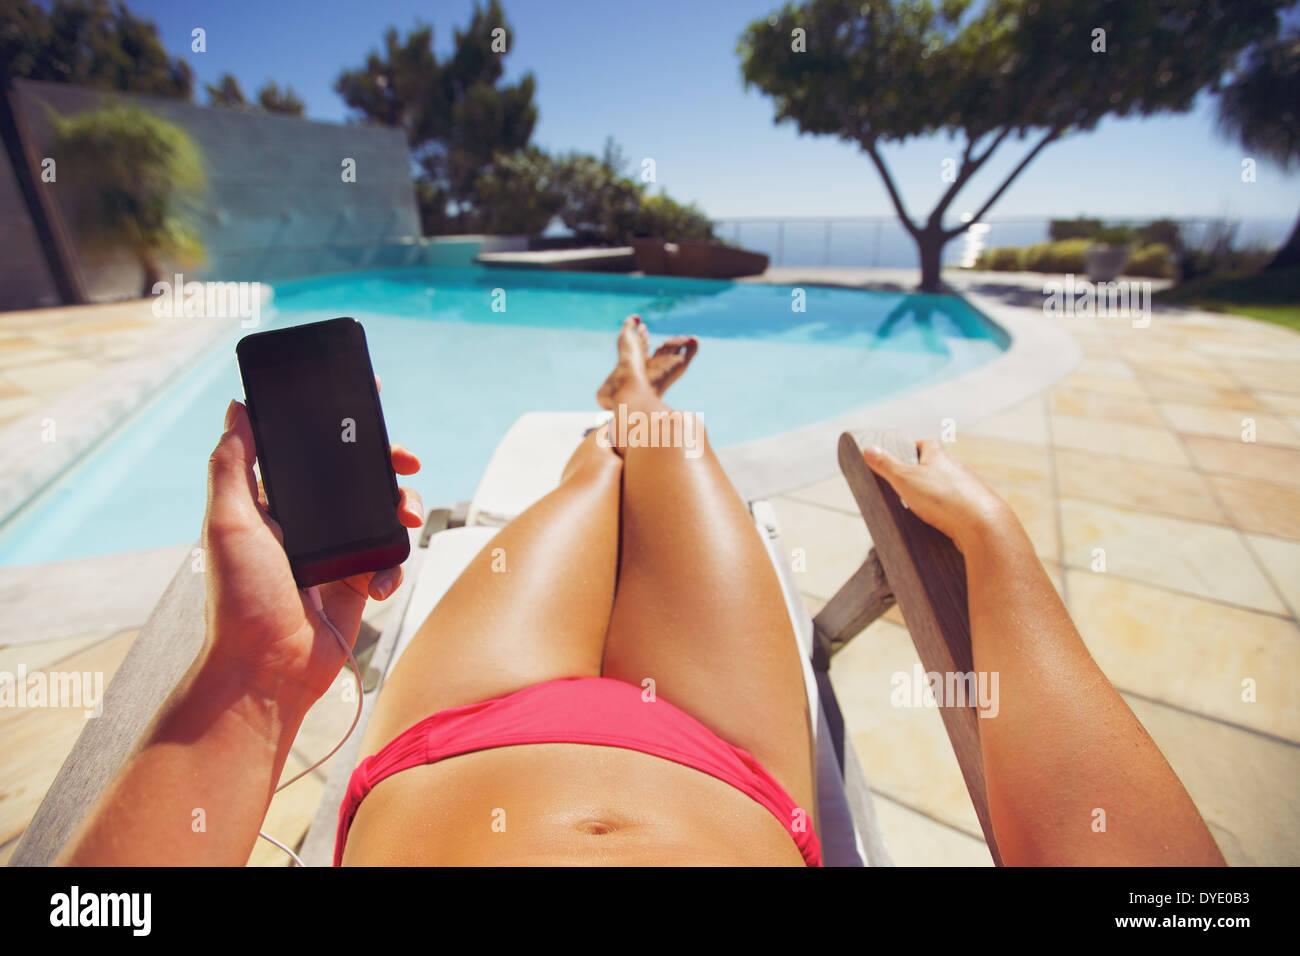 Seorita vistiendo bikini a travs de telfono mvil mientras toma el sol en la piscina Modelo